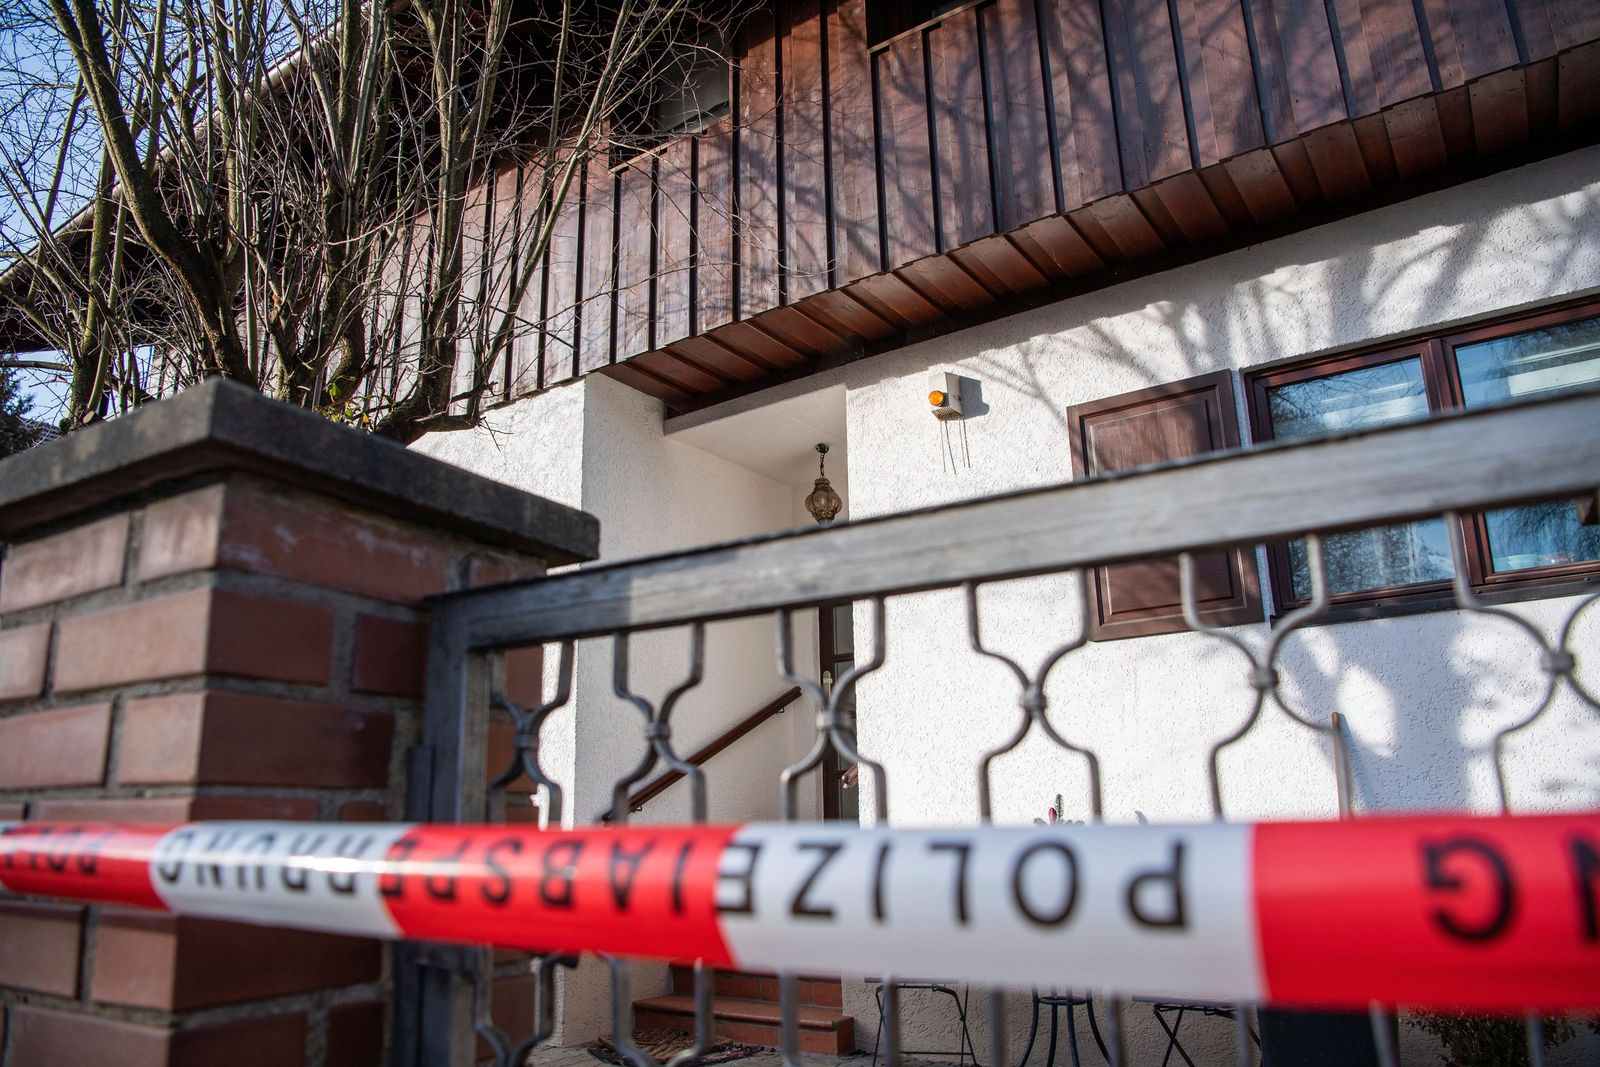 Eltern und Sohn in Starnberg ermordet